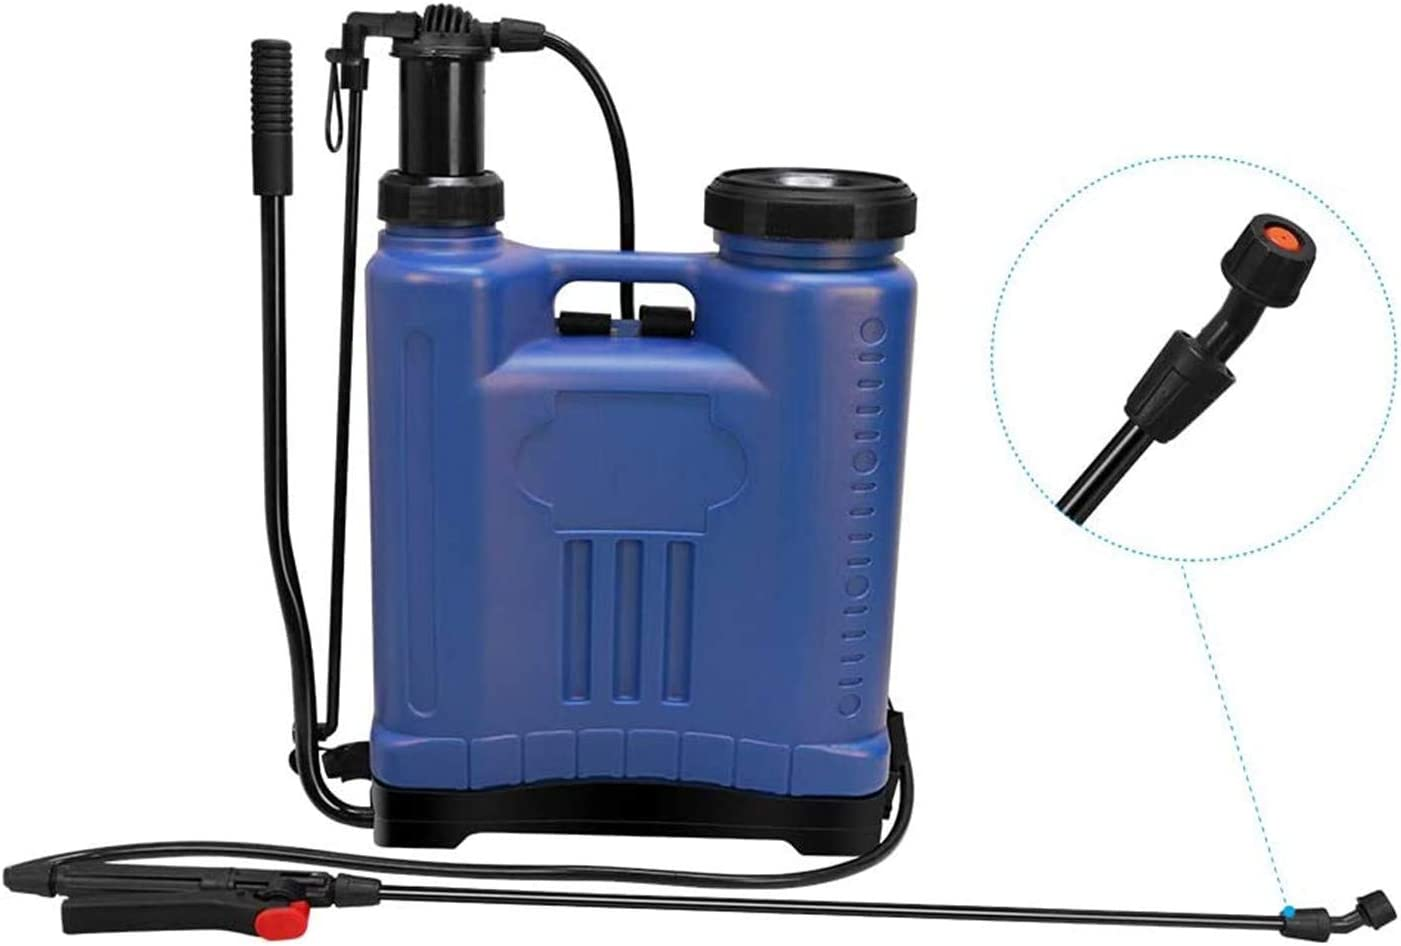 Ranking TOP11 Beaugreen Pump Pressure Sprayer Super-cheap Knapsack Garden Backpack